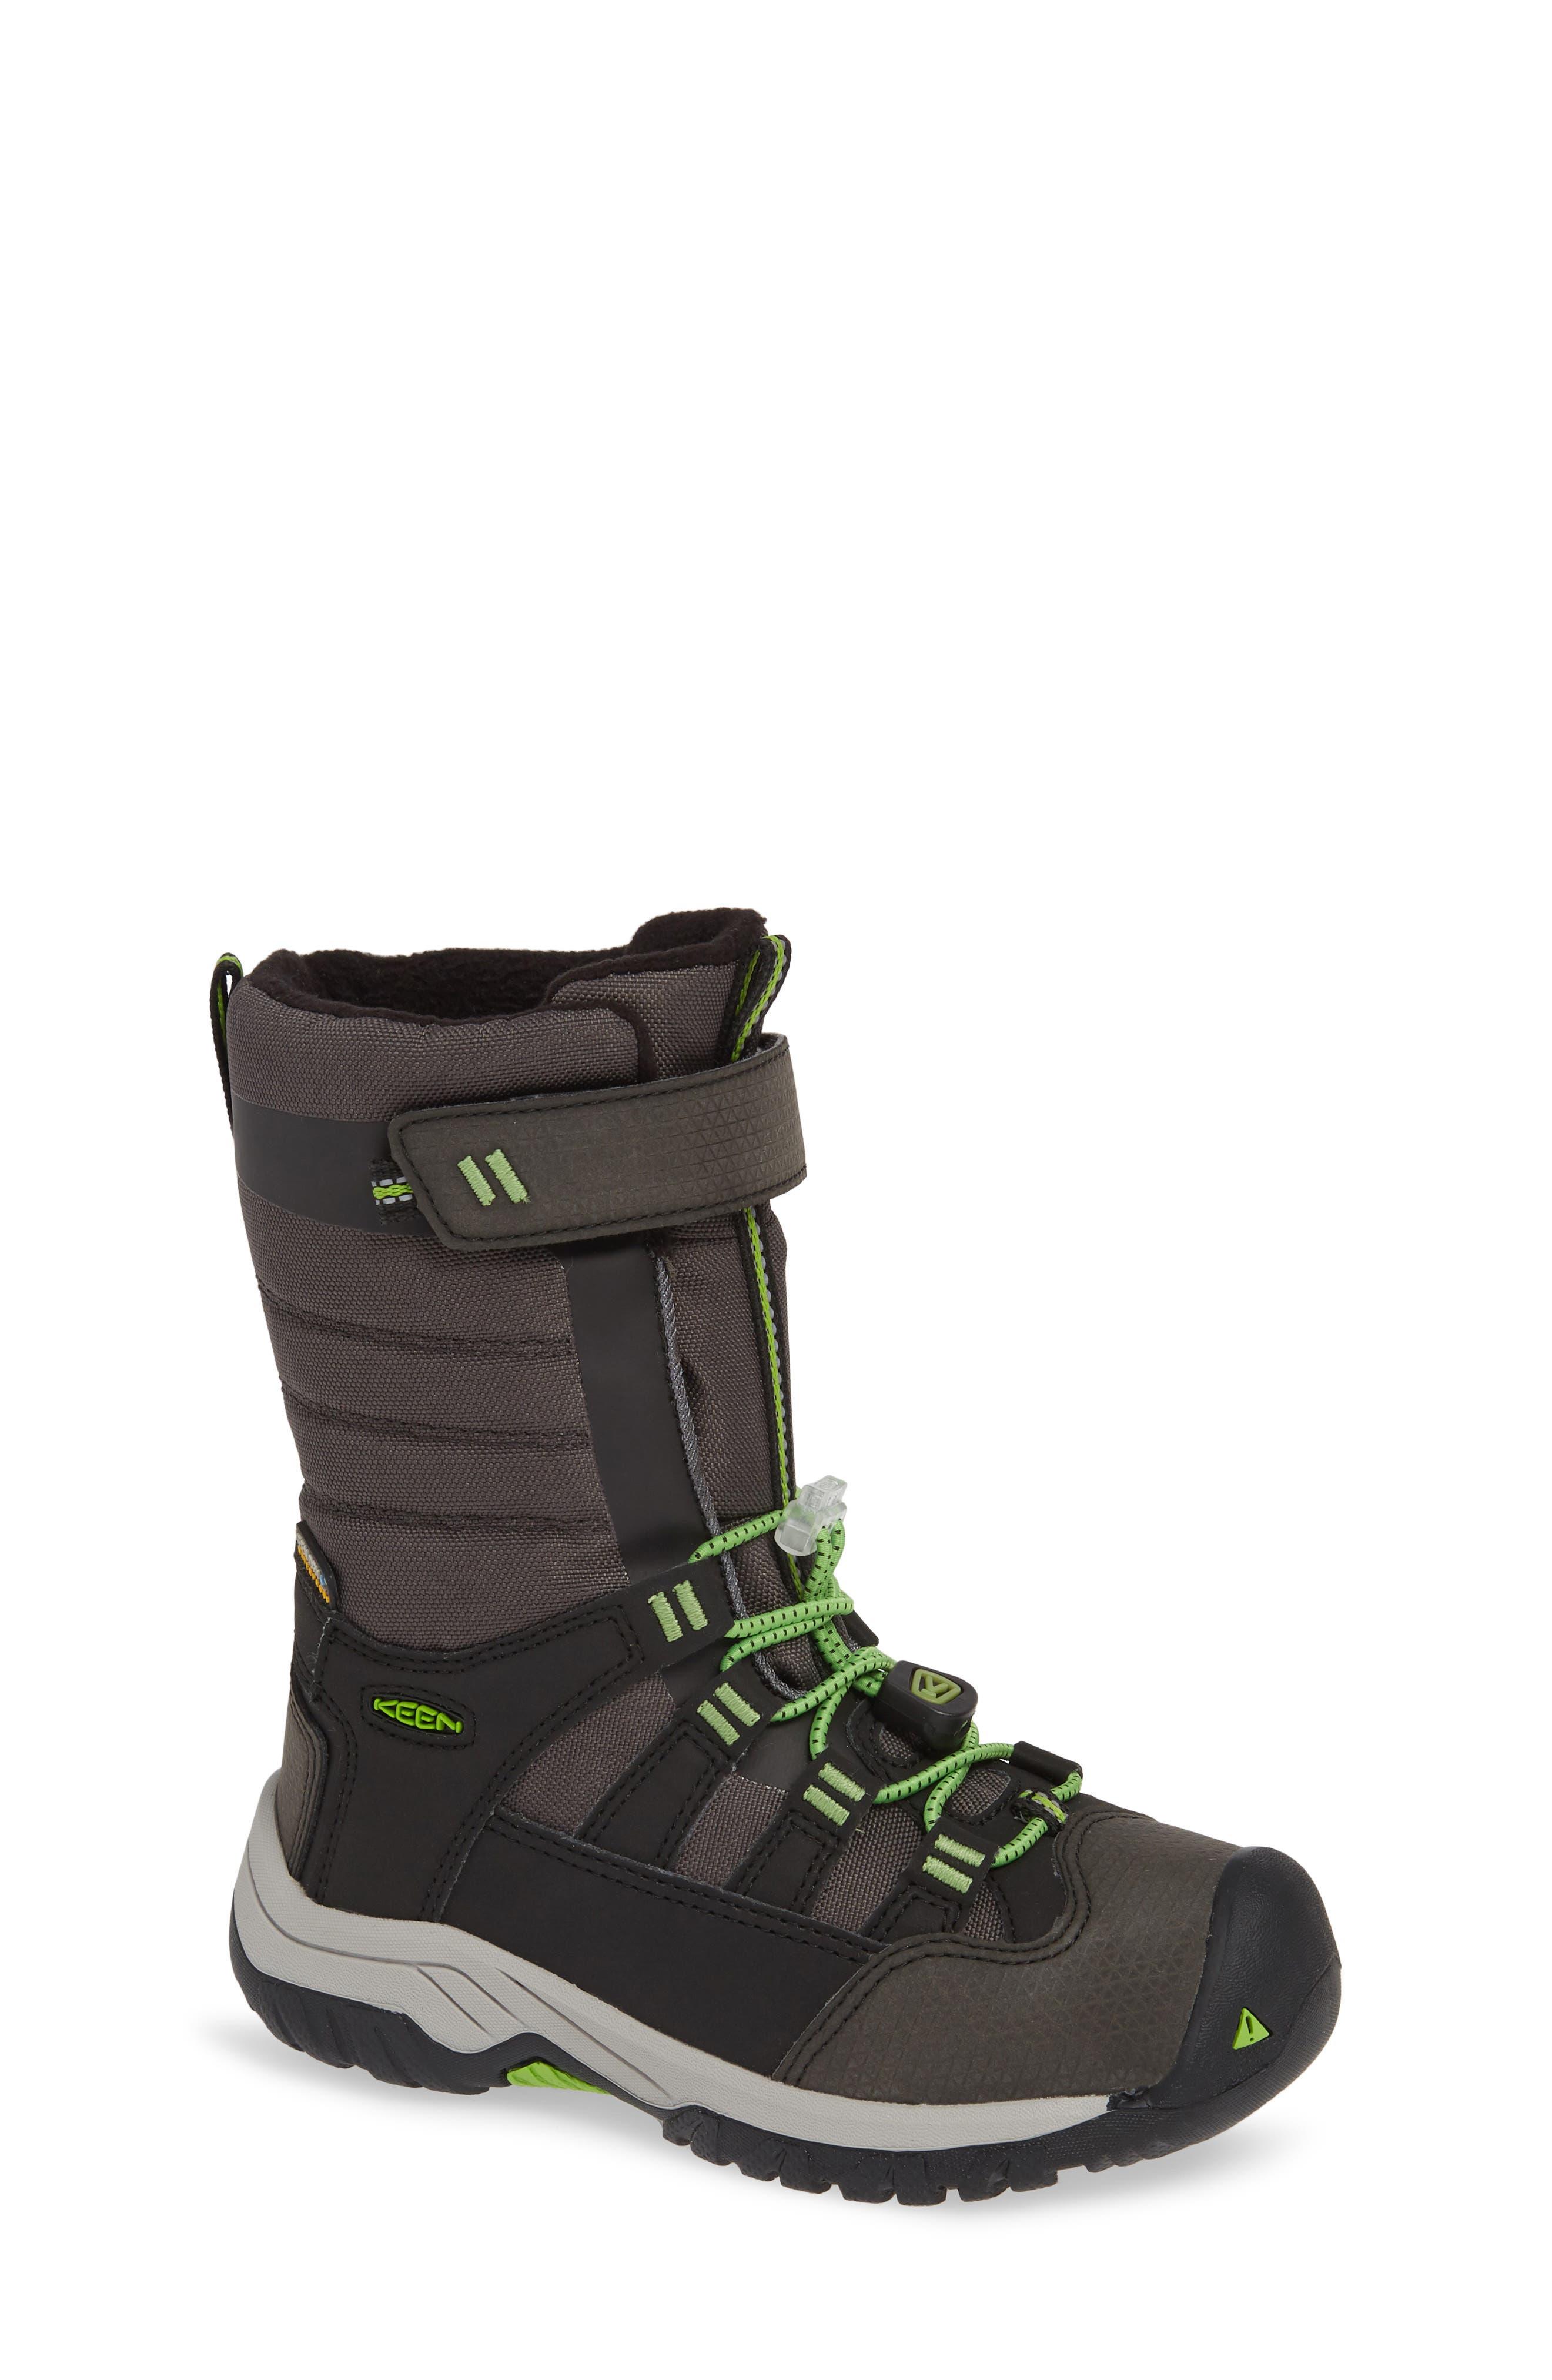 Winterport Neo Waterproof Insulated Boot, Main, color, BLACK/ GREENERY